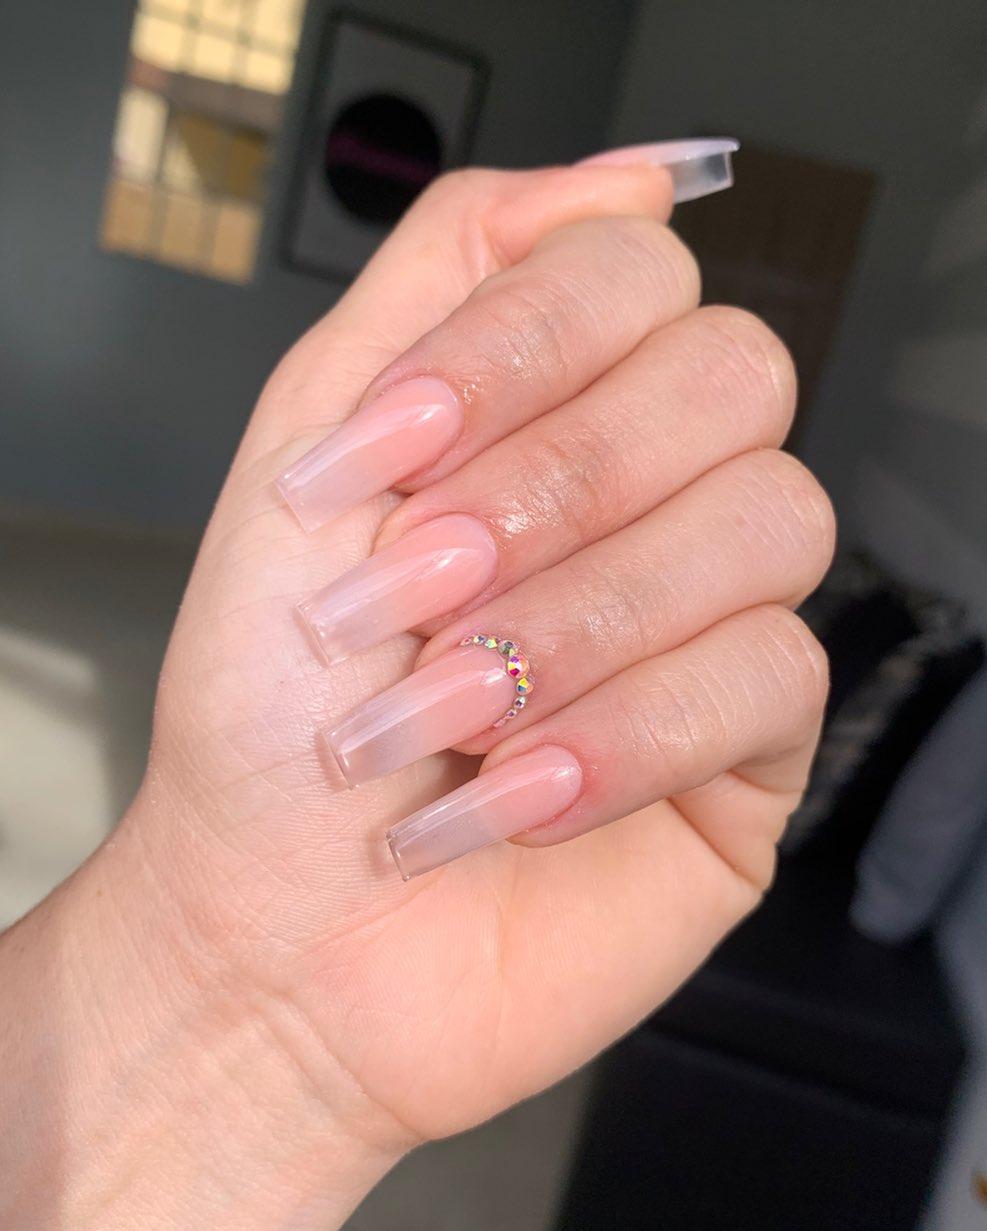 Glass Ombré! Nailart Cut Cuticleoil - Nails